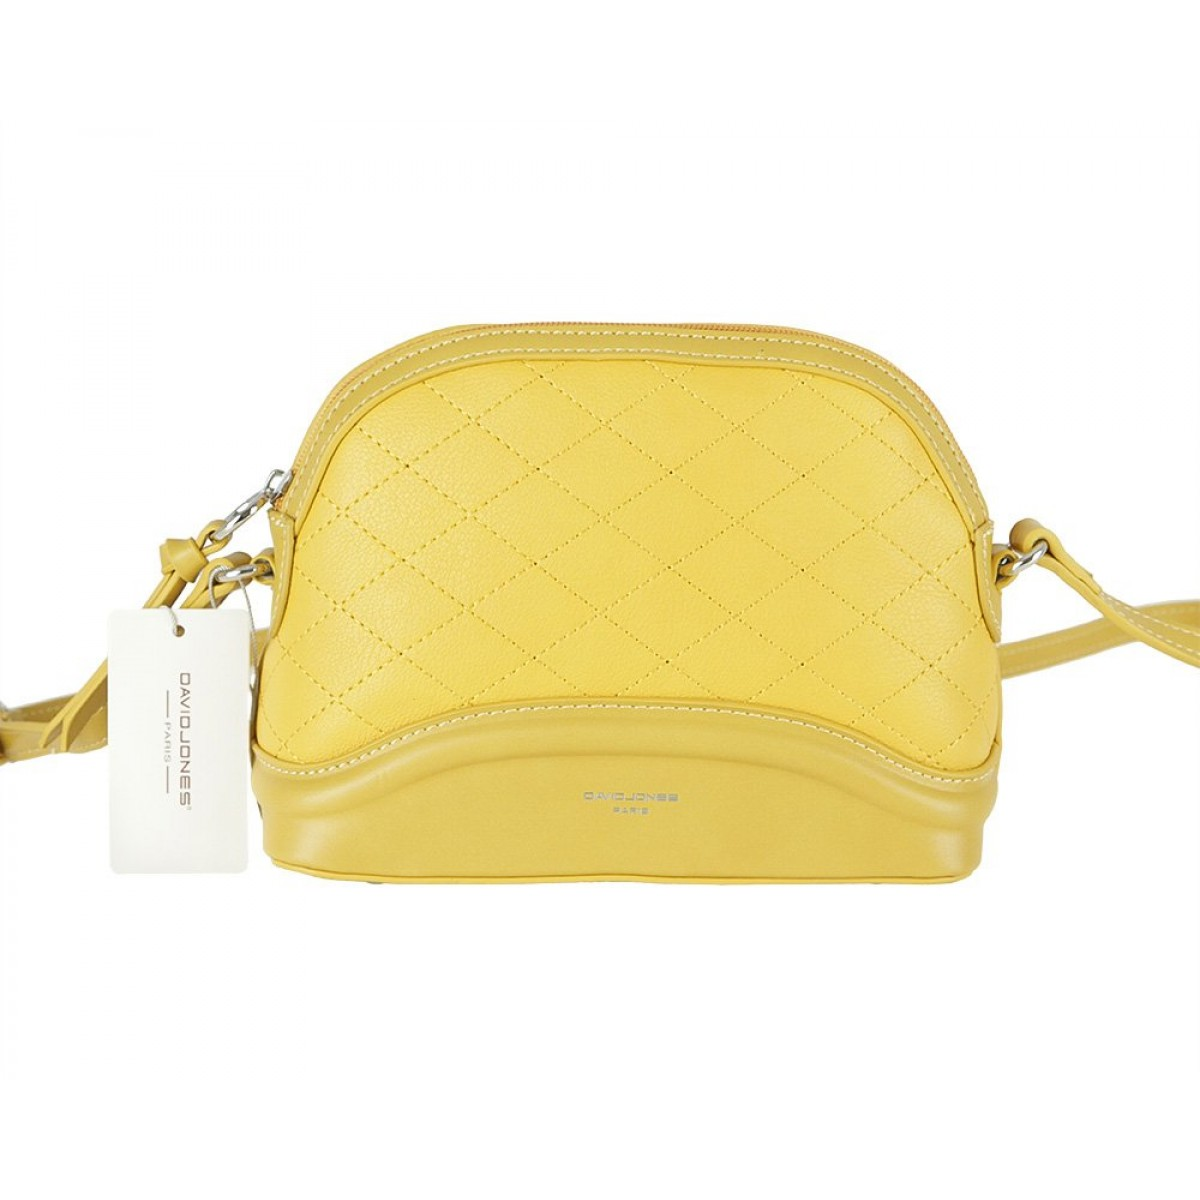 Жіноча сумка David Jones 6292-1A MUSTARD